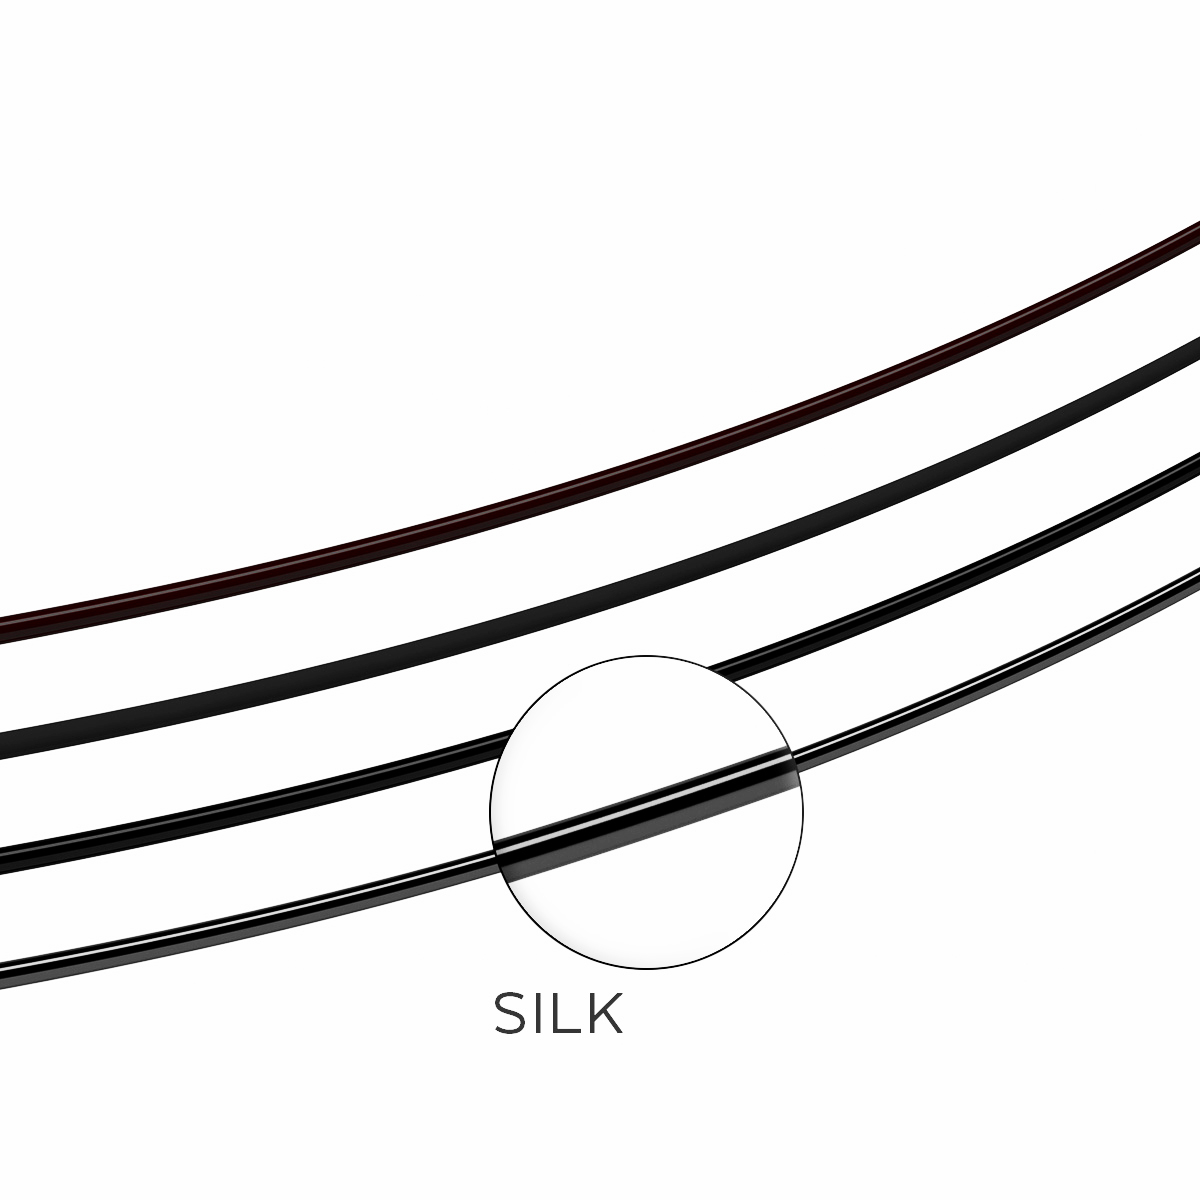 rzesy-silk-black-d-0-15